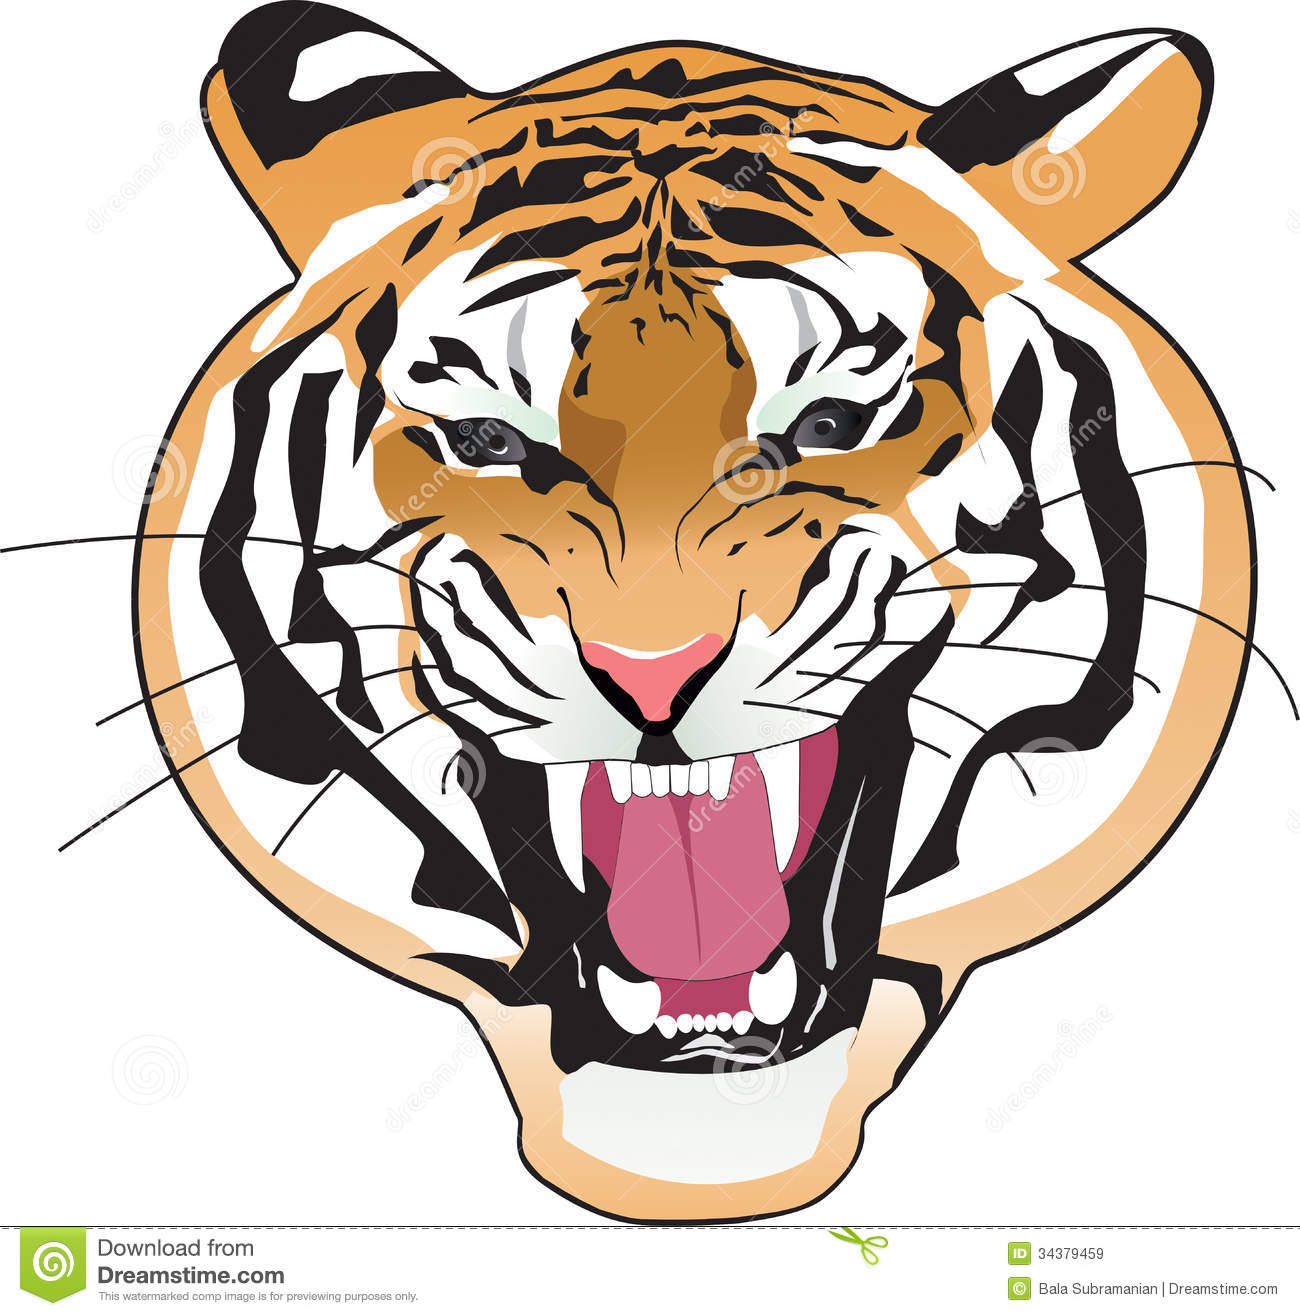 Tiger clipart mean transparent Tiger Face Clip Art | Clipart Panda - Free Clipart Images transparent